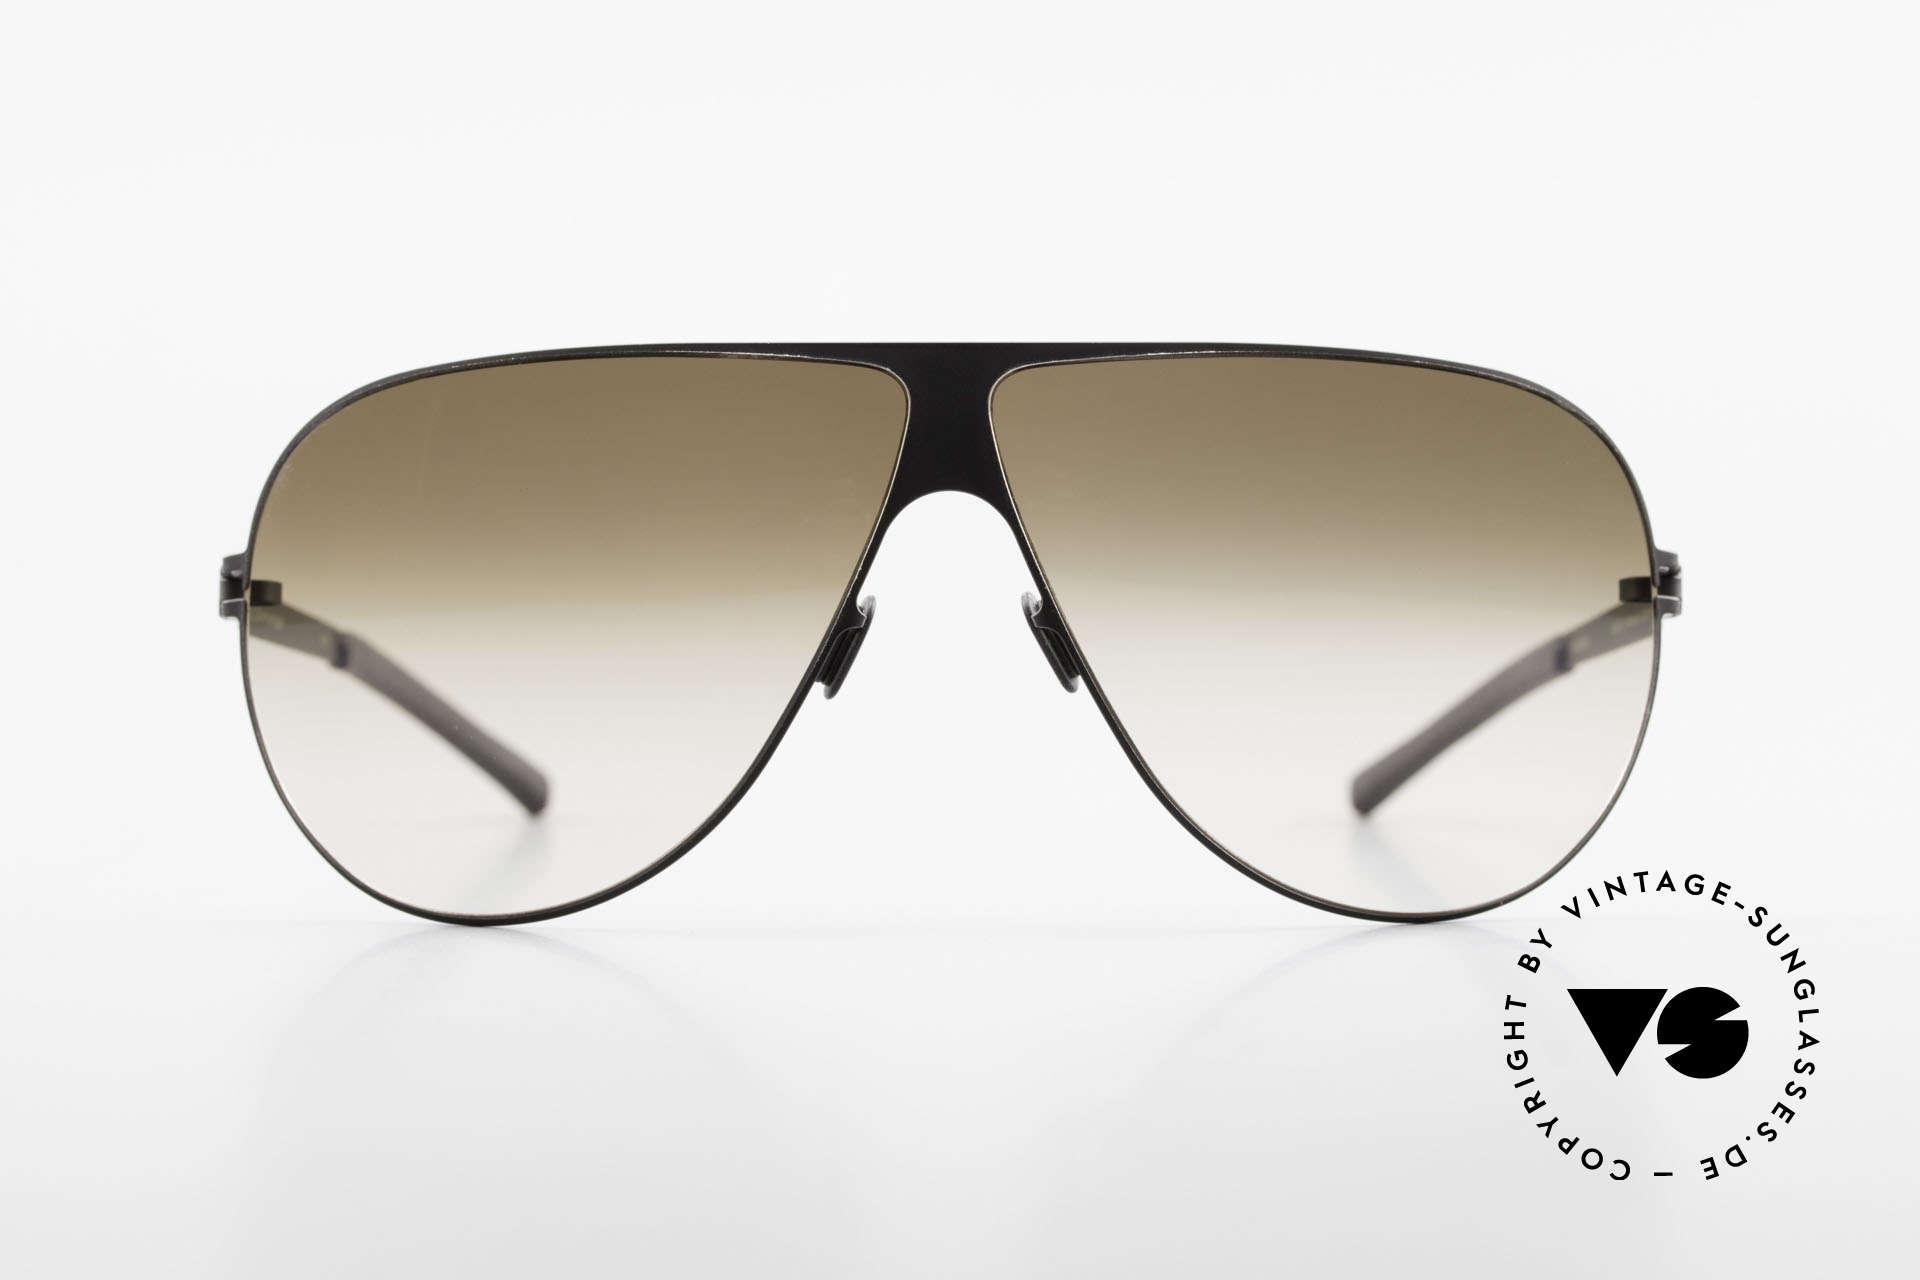 Mykita Elliot Mykita Tom Cruise Sonnenbrille, Mykita: die jüngste Marke in unserem vintage Sortiment, Passend für Herren